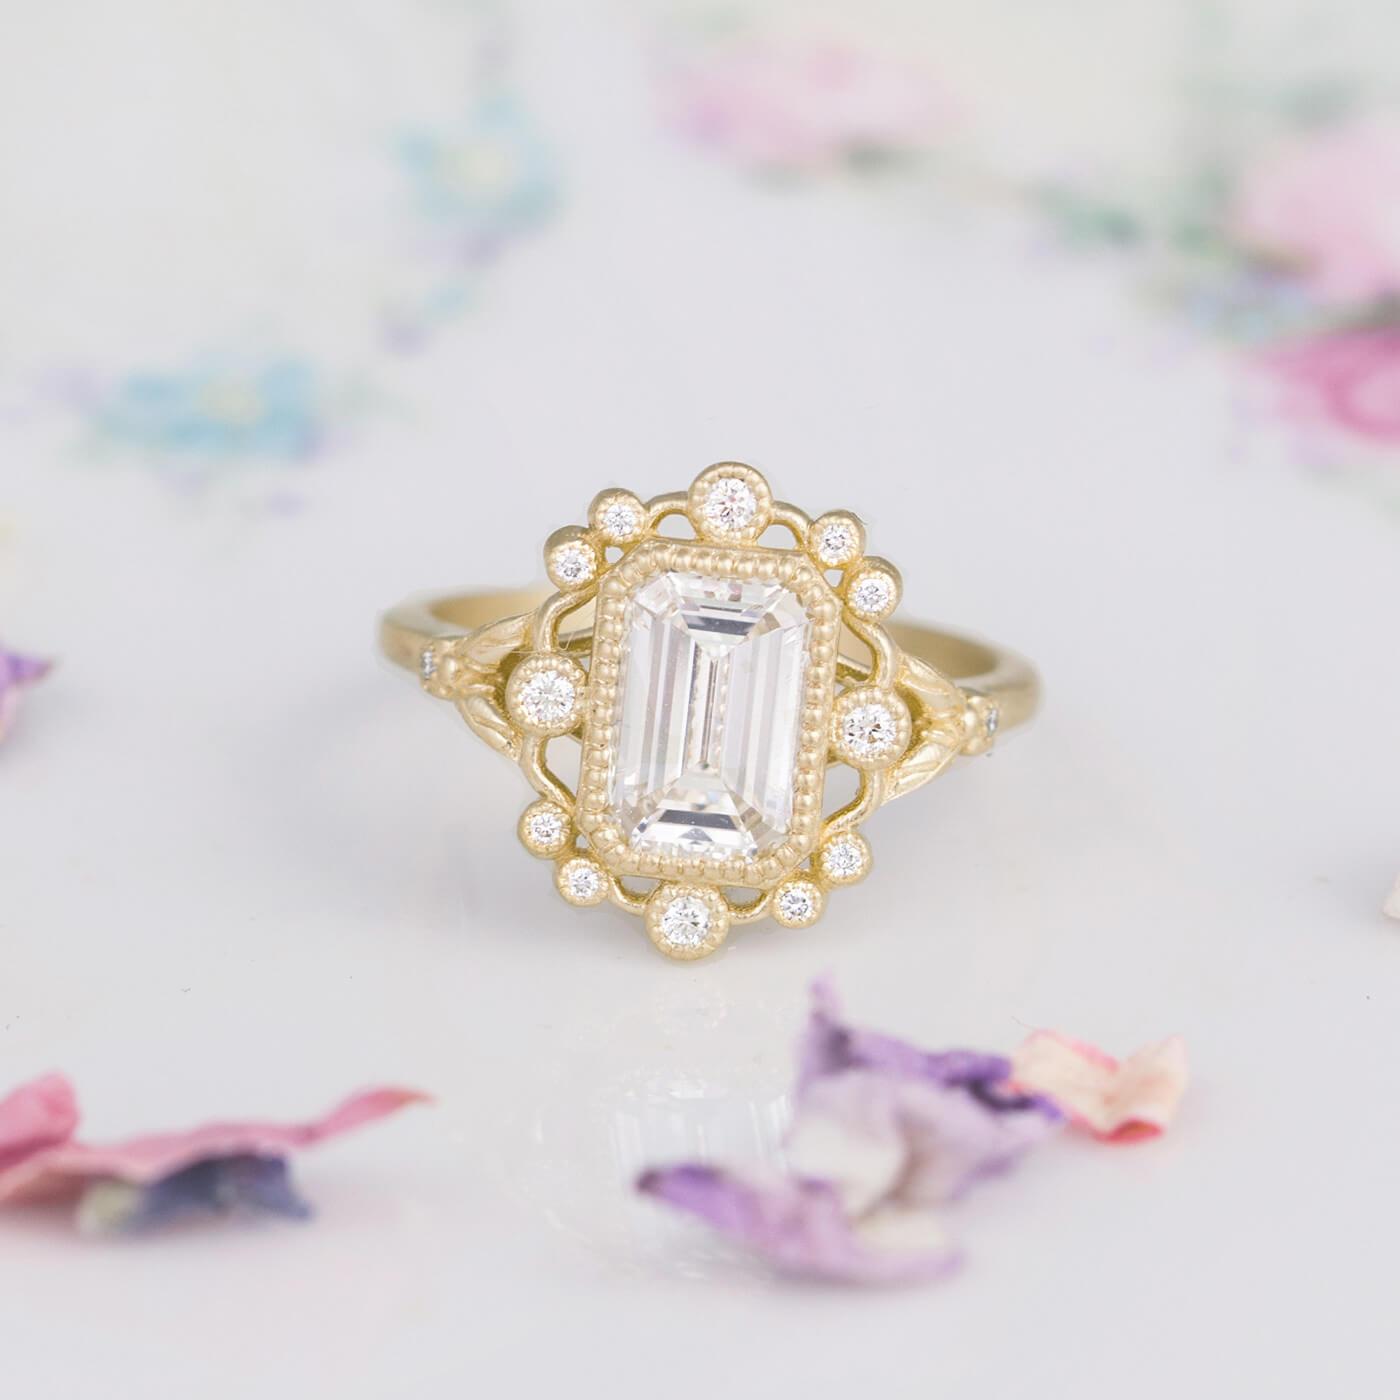 Mirabelle Vintage Inspired Ring Setting